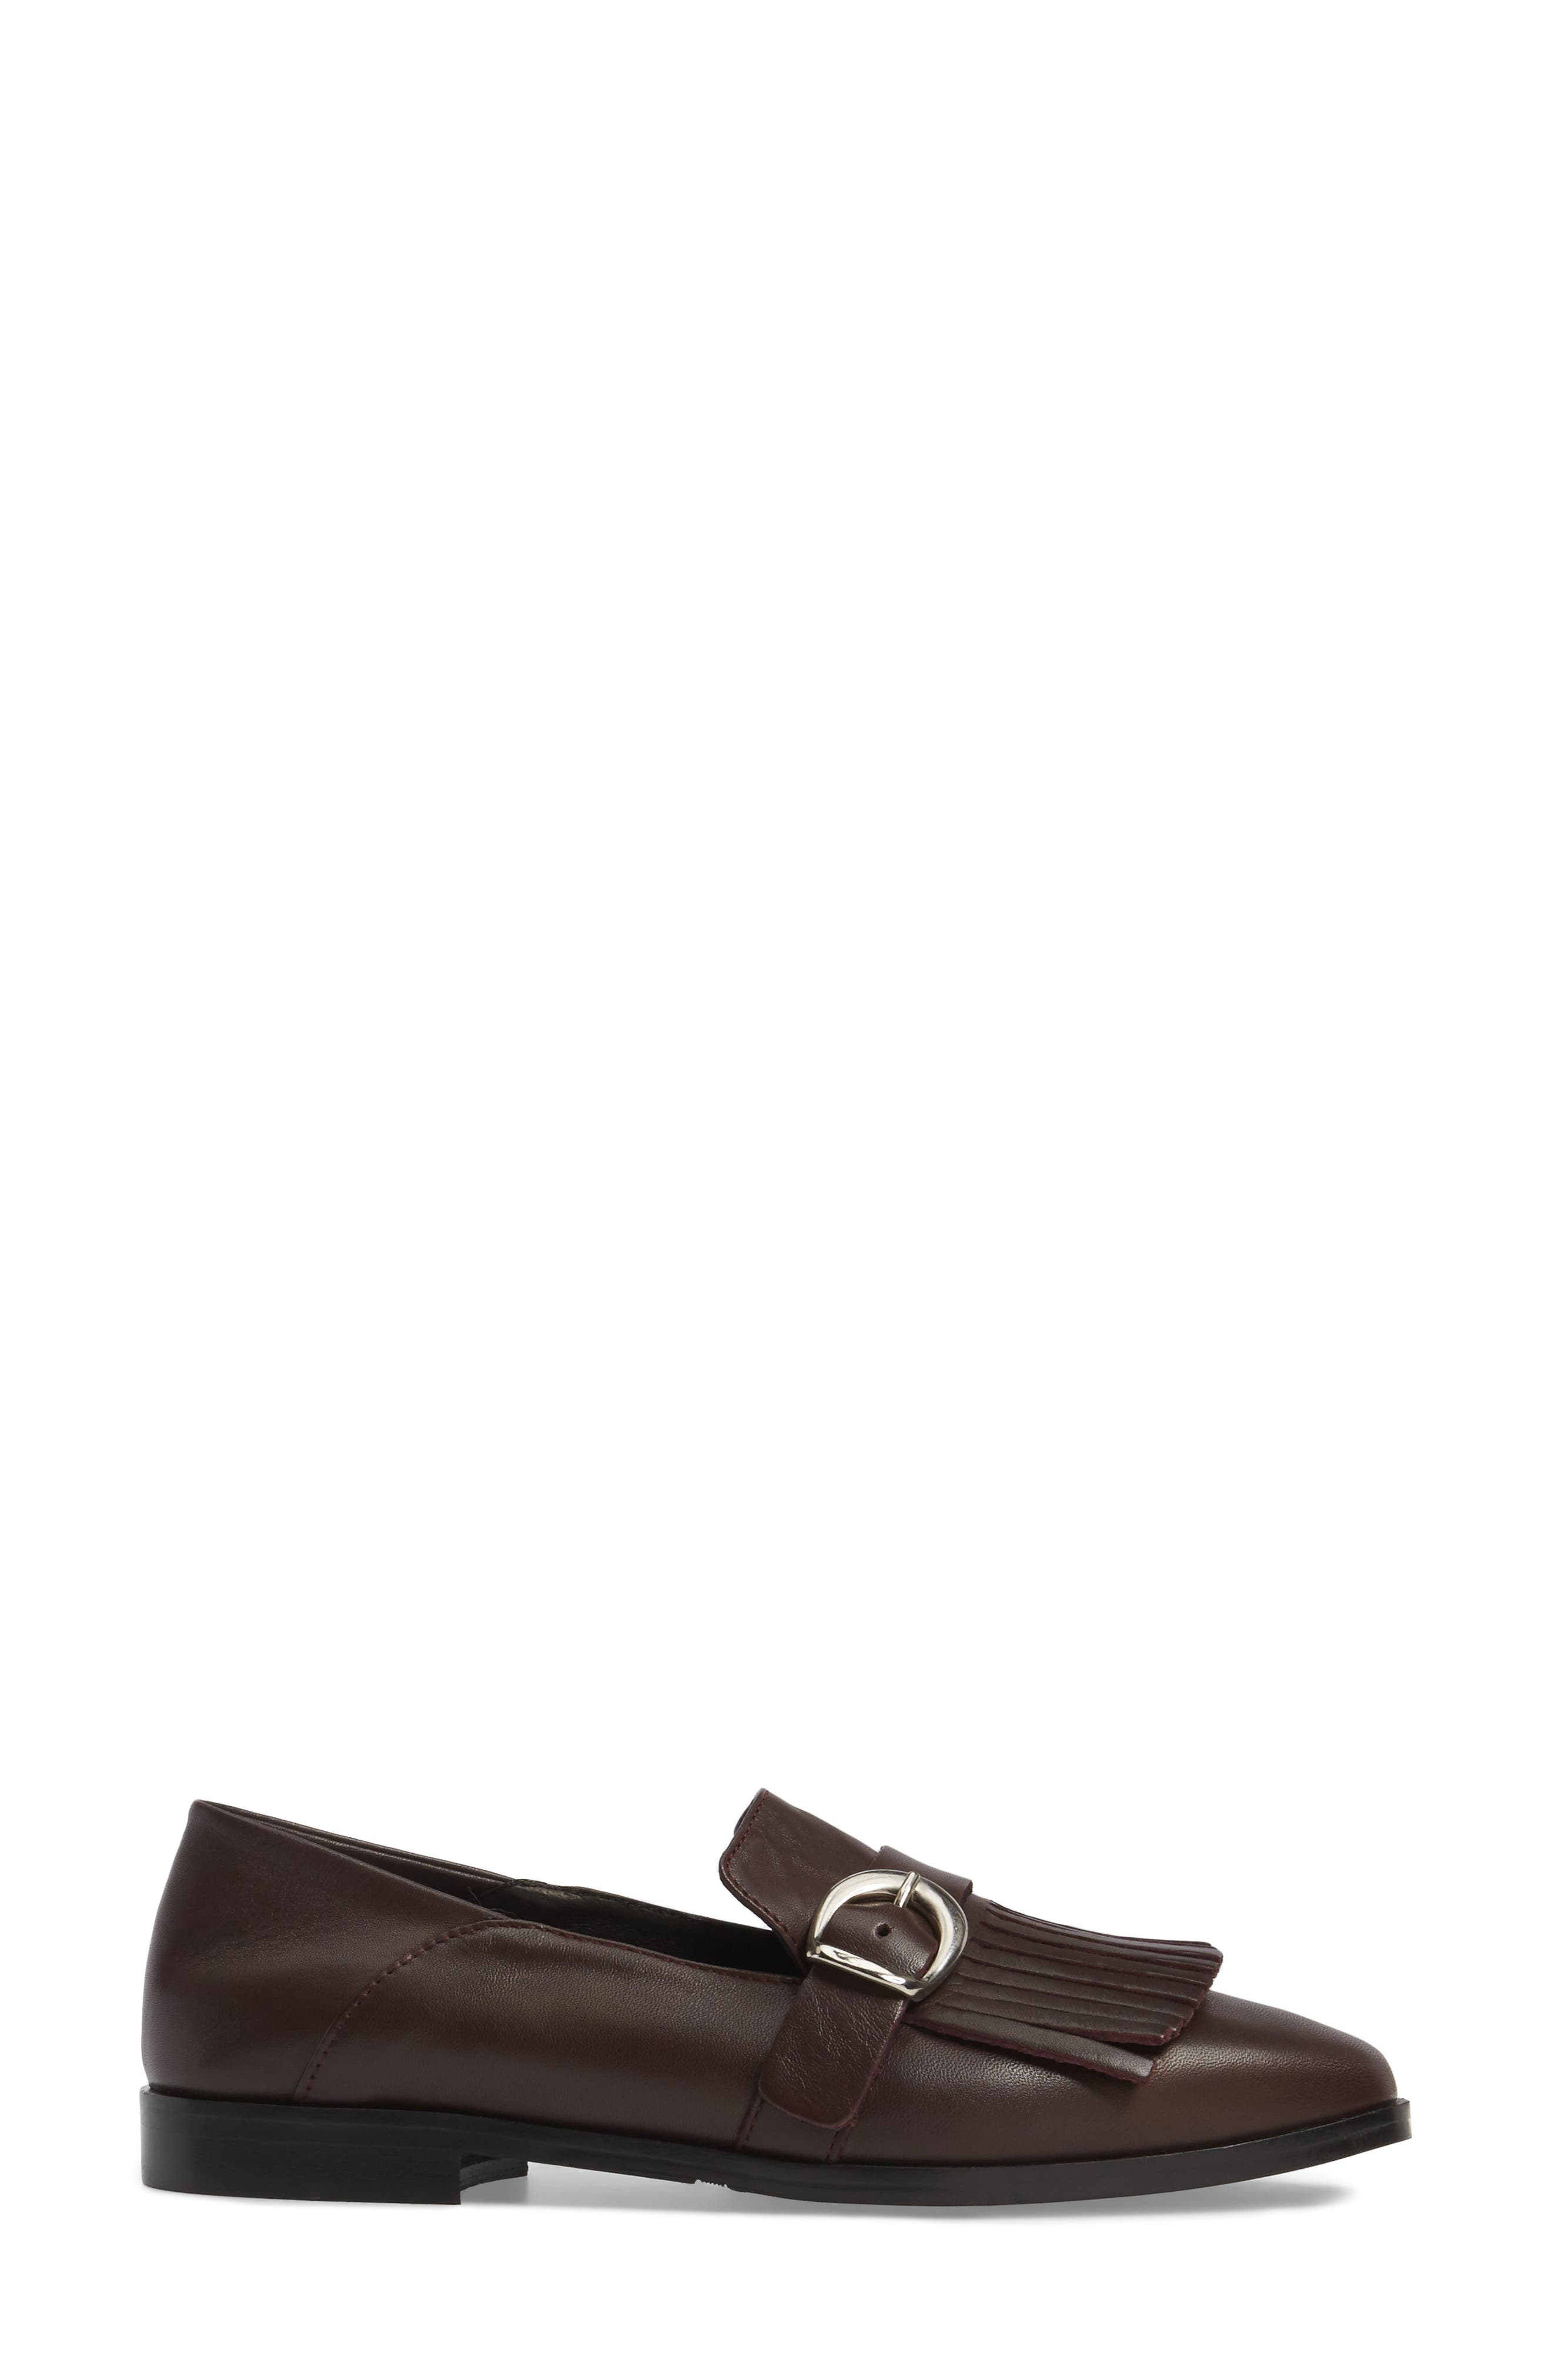 Dame Fringed Loafer Flat,                             Alternate thumbnail 3, color,                             Burgundy Leather